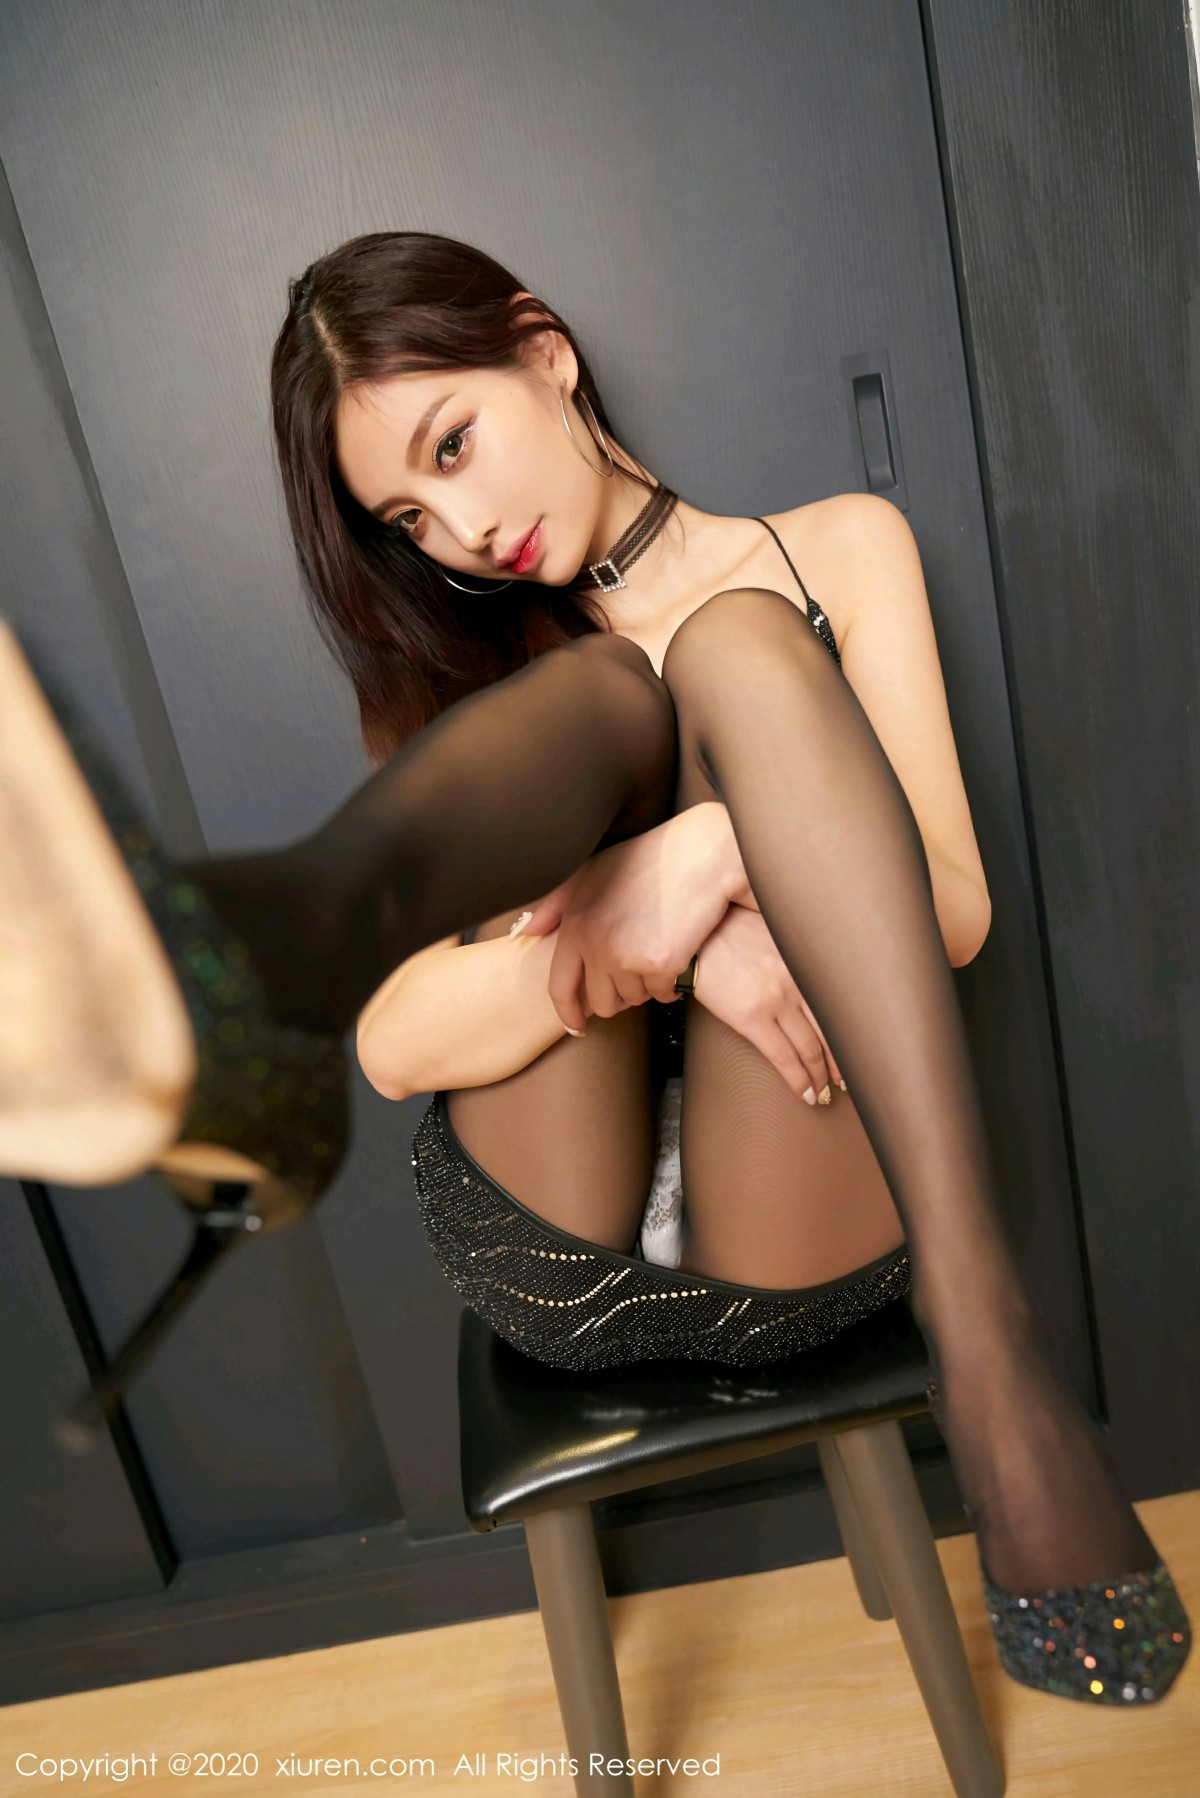 [XiuRen秀人网] 2020.09.03 No.2523 杨晨晨sugar 极致黑丝 第3张